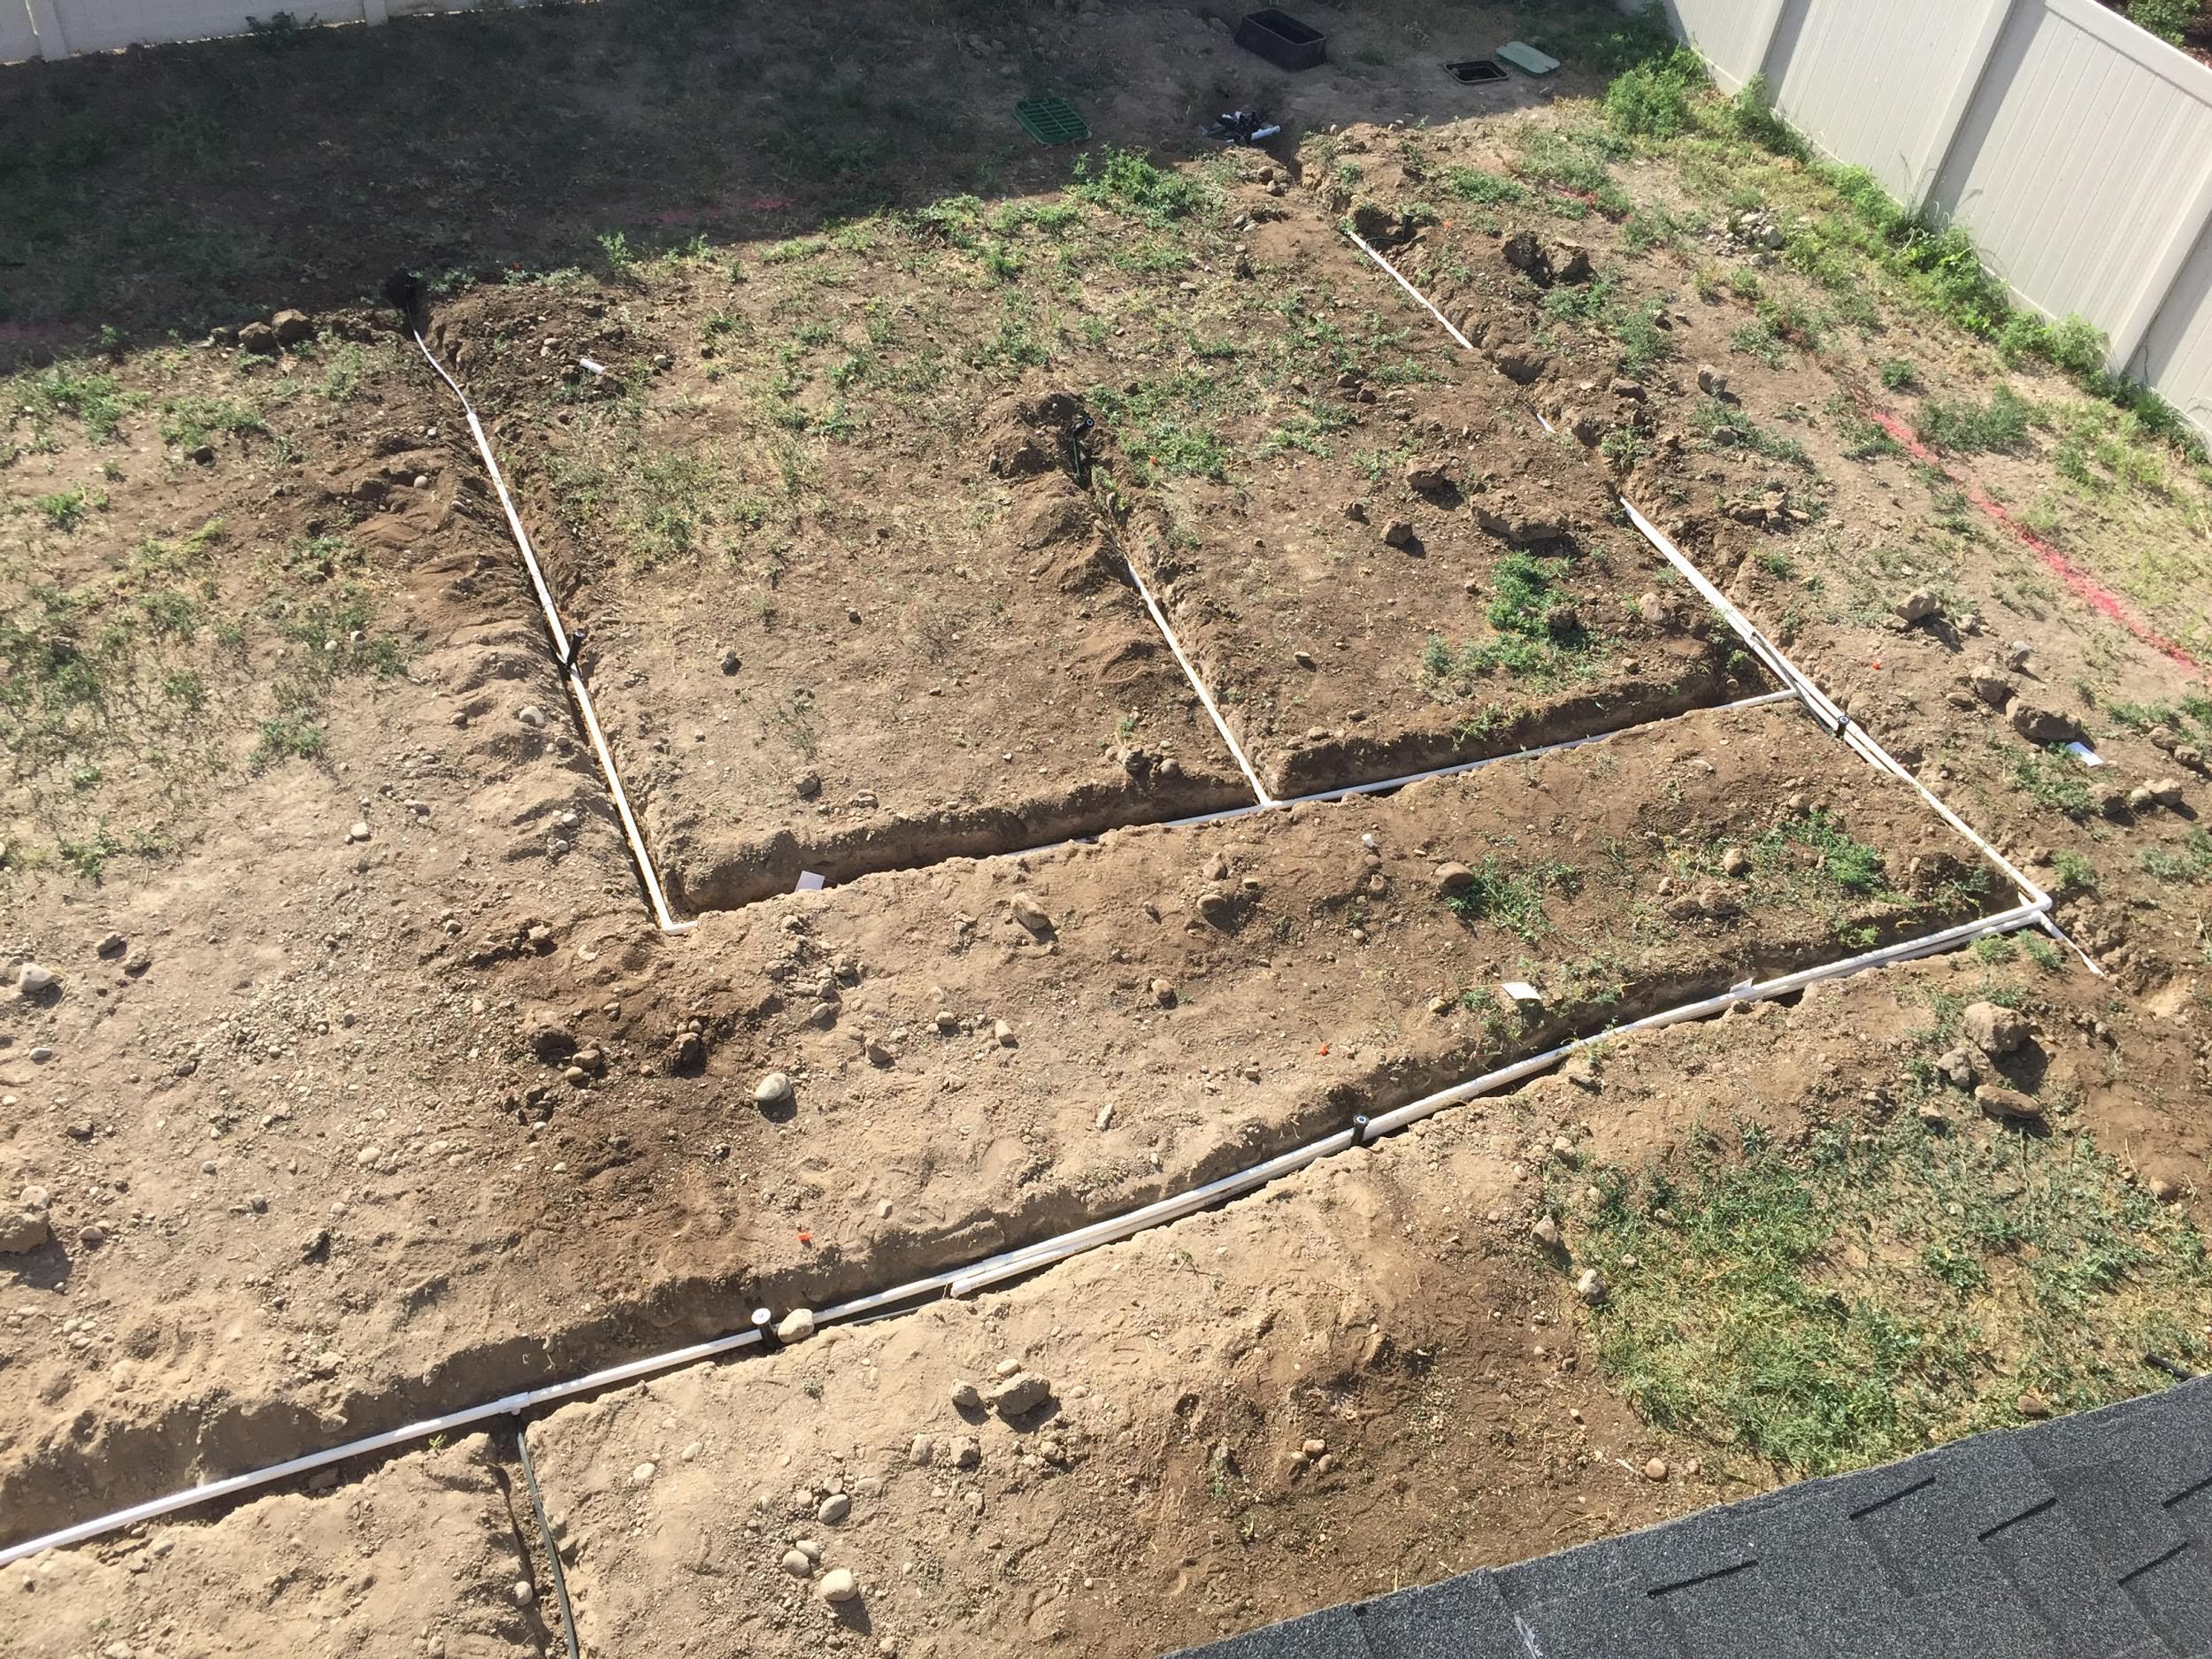 Installing sprinkler pipes underground for backyard sprinkler system